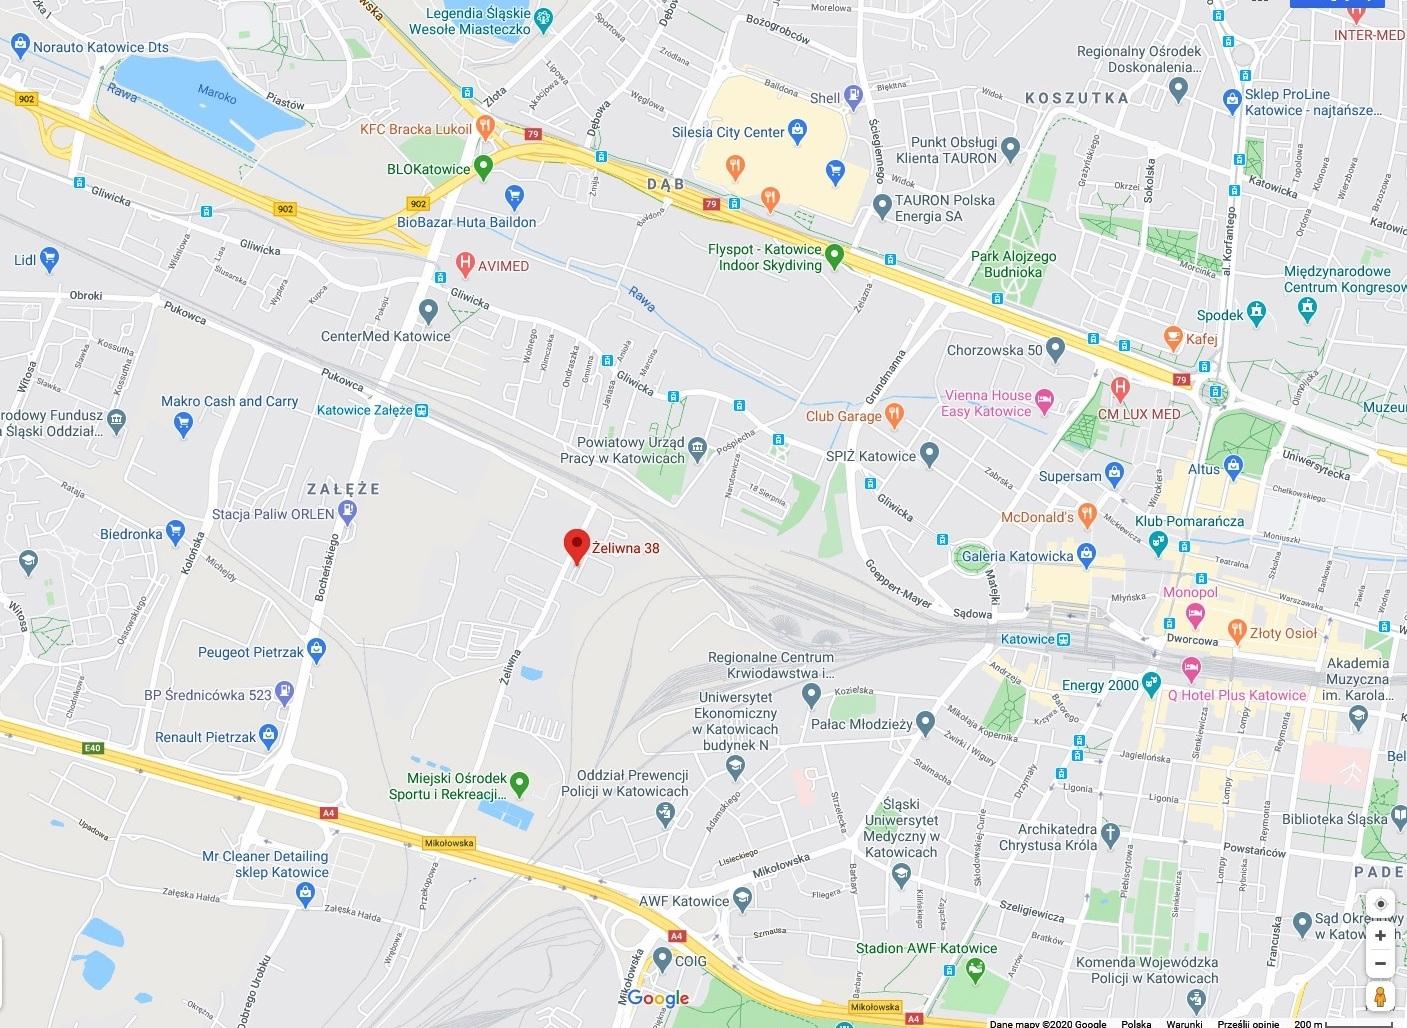 mapa_żeliwna38.jpg